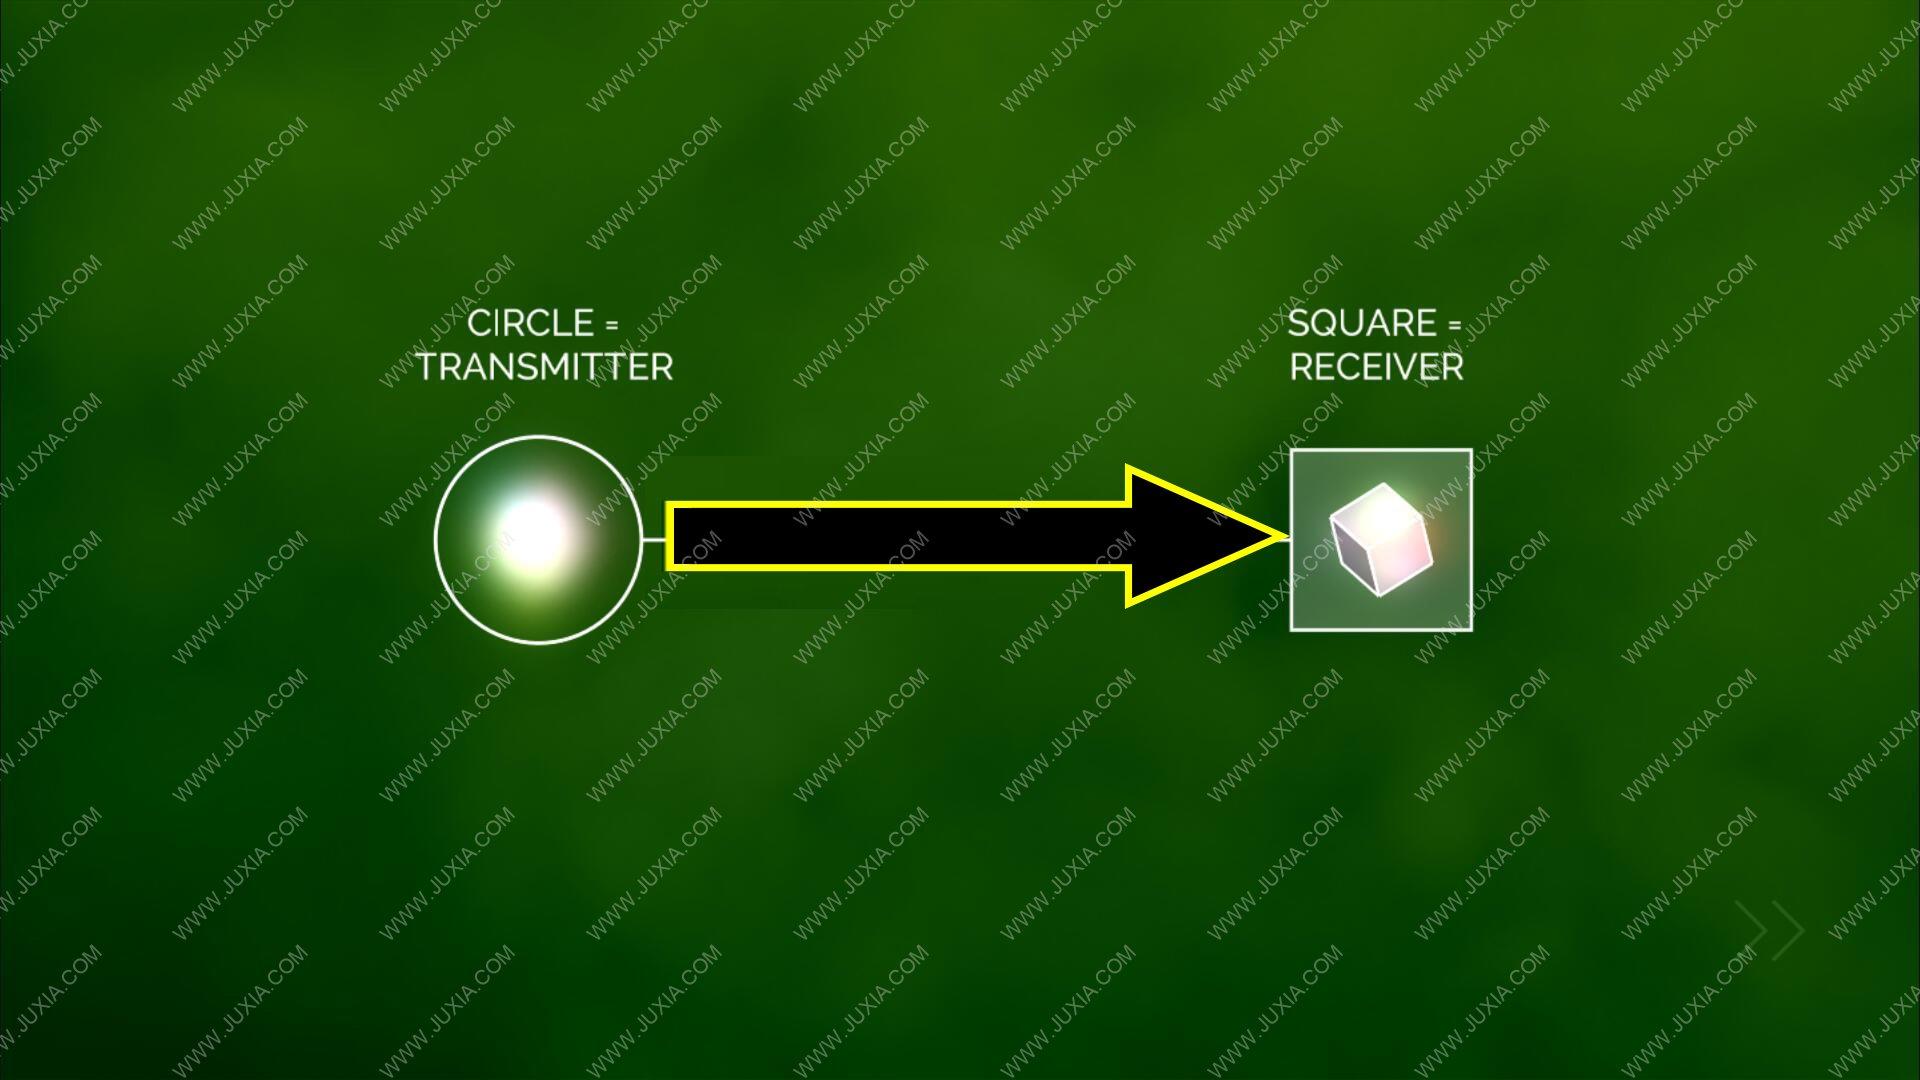 Transmission游戏攻略第一关 传送传输第1关怎么过